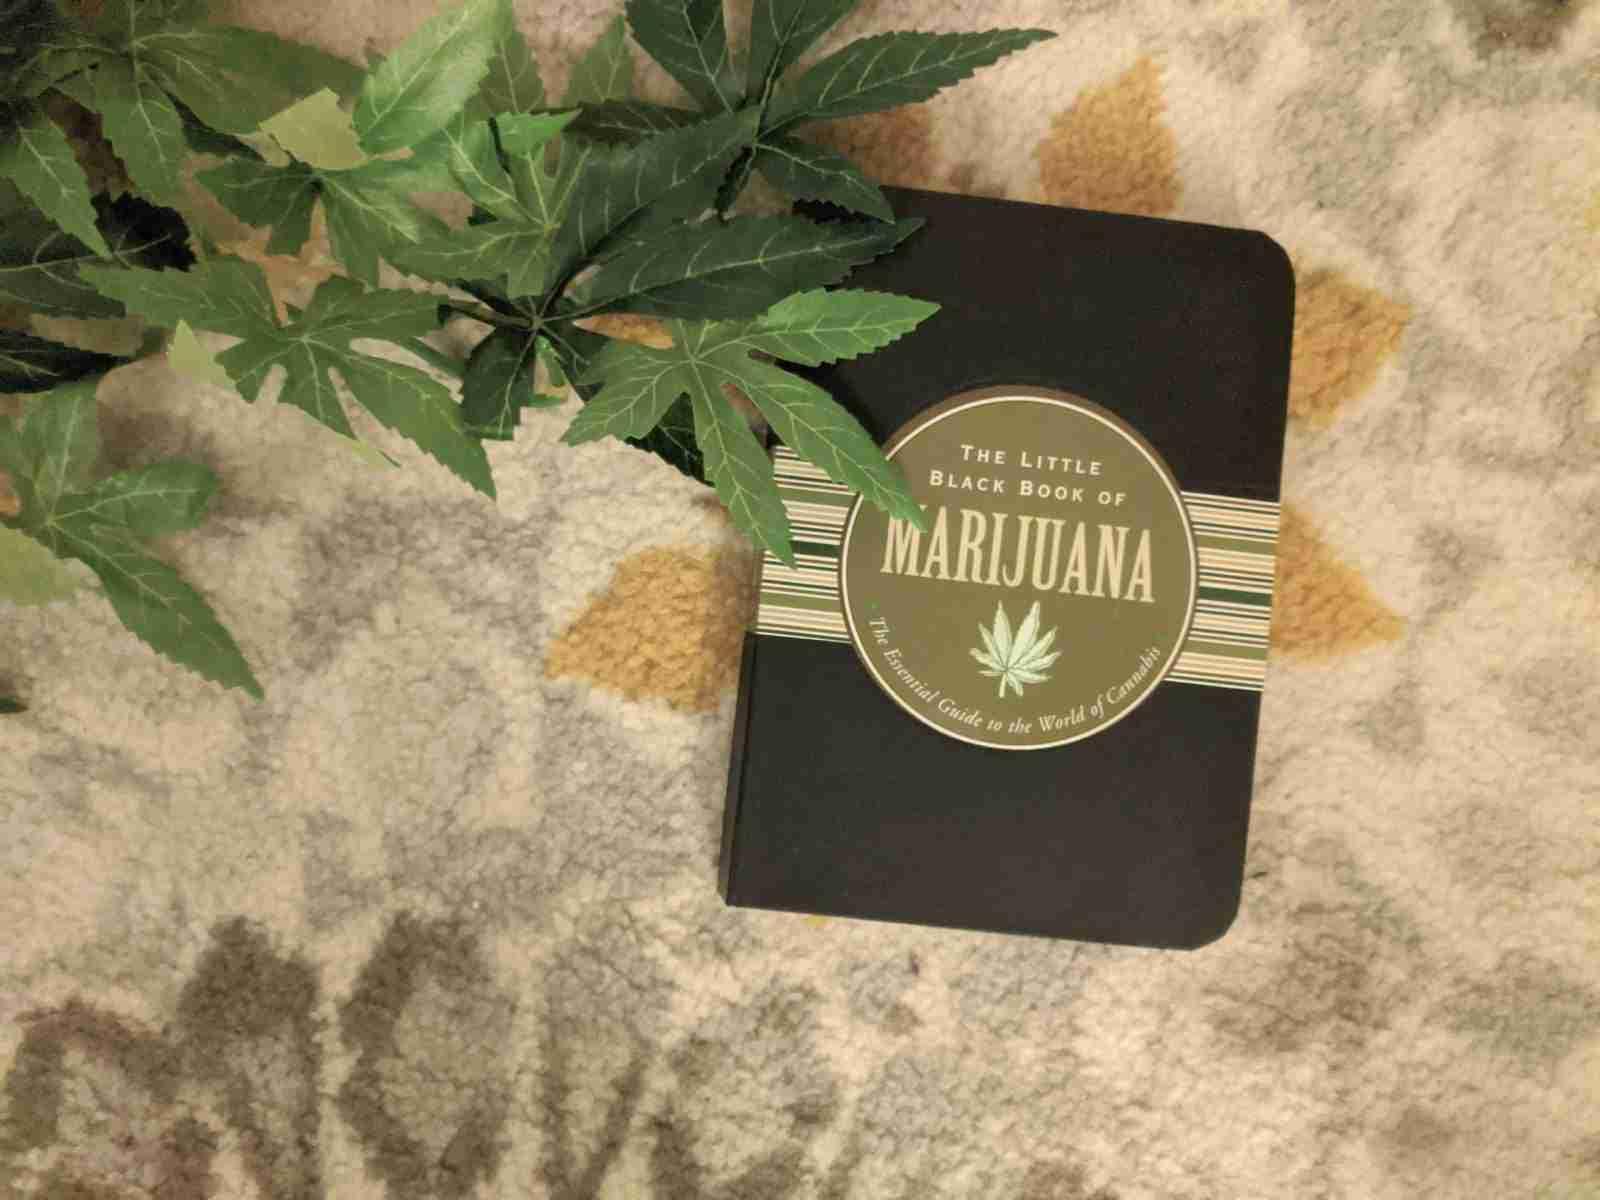 Little Black Book of Cannabis